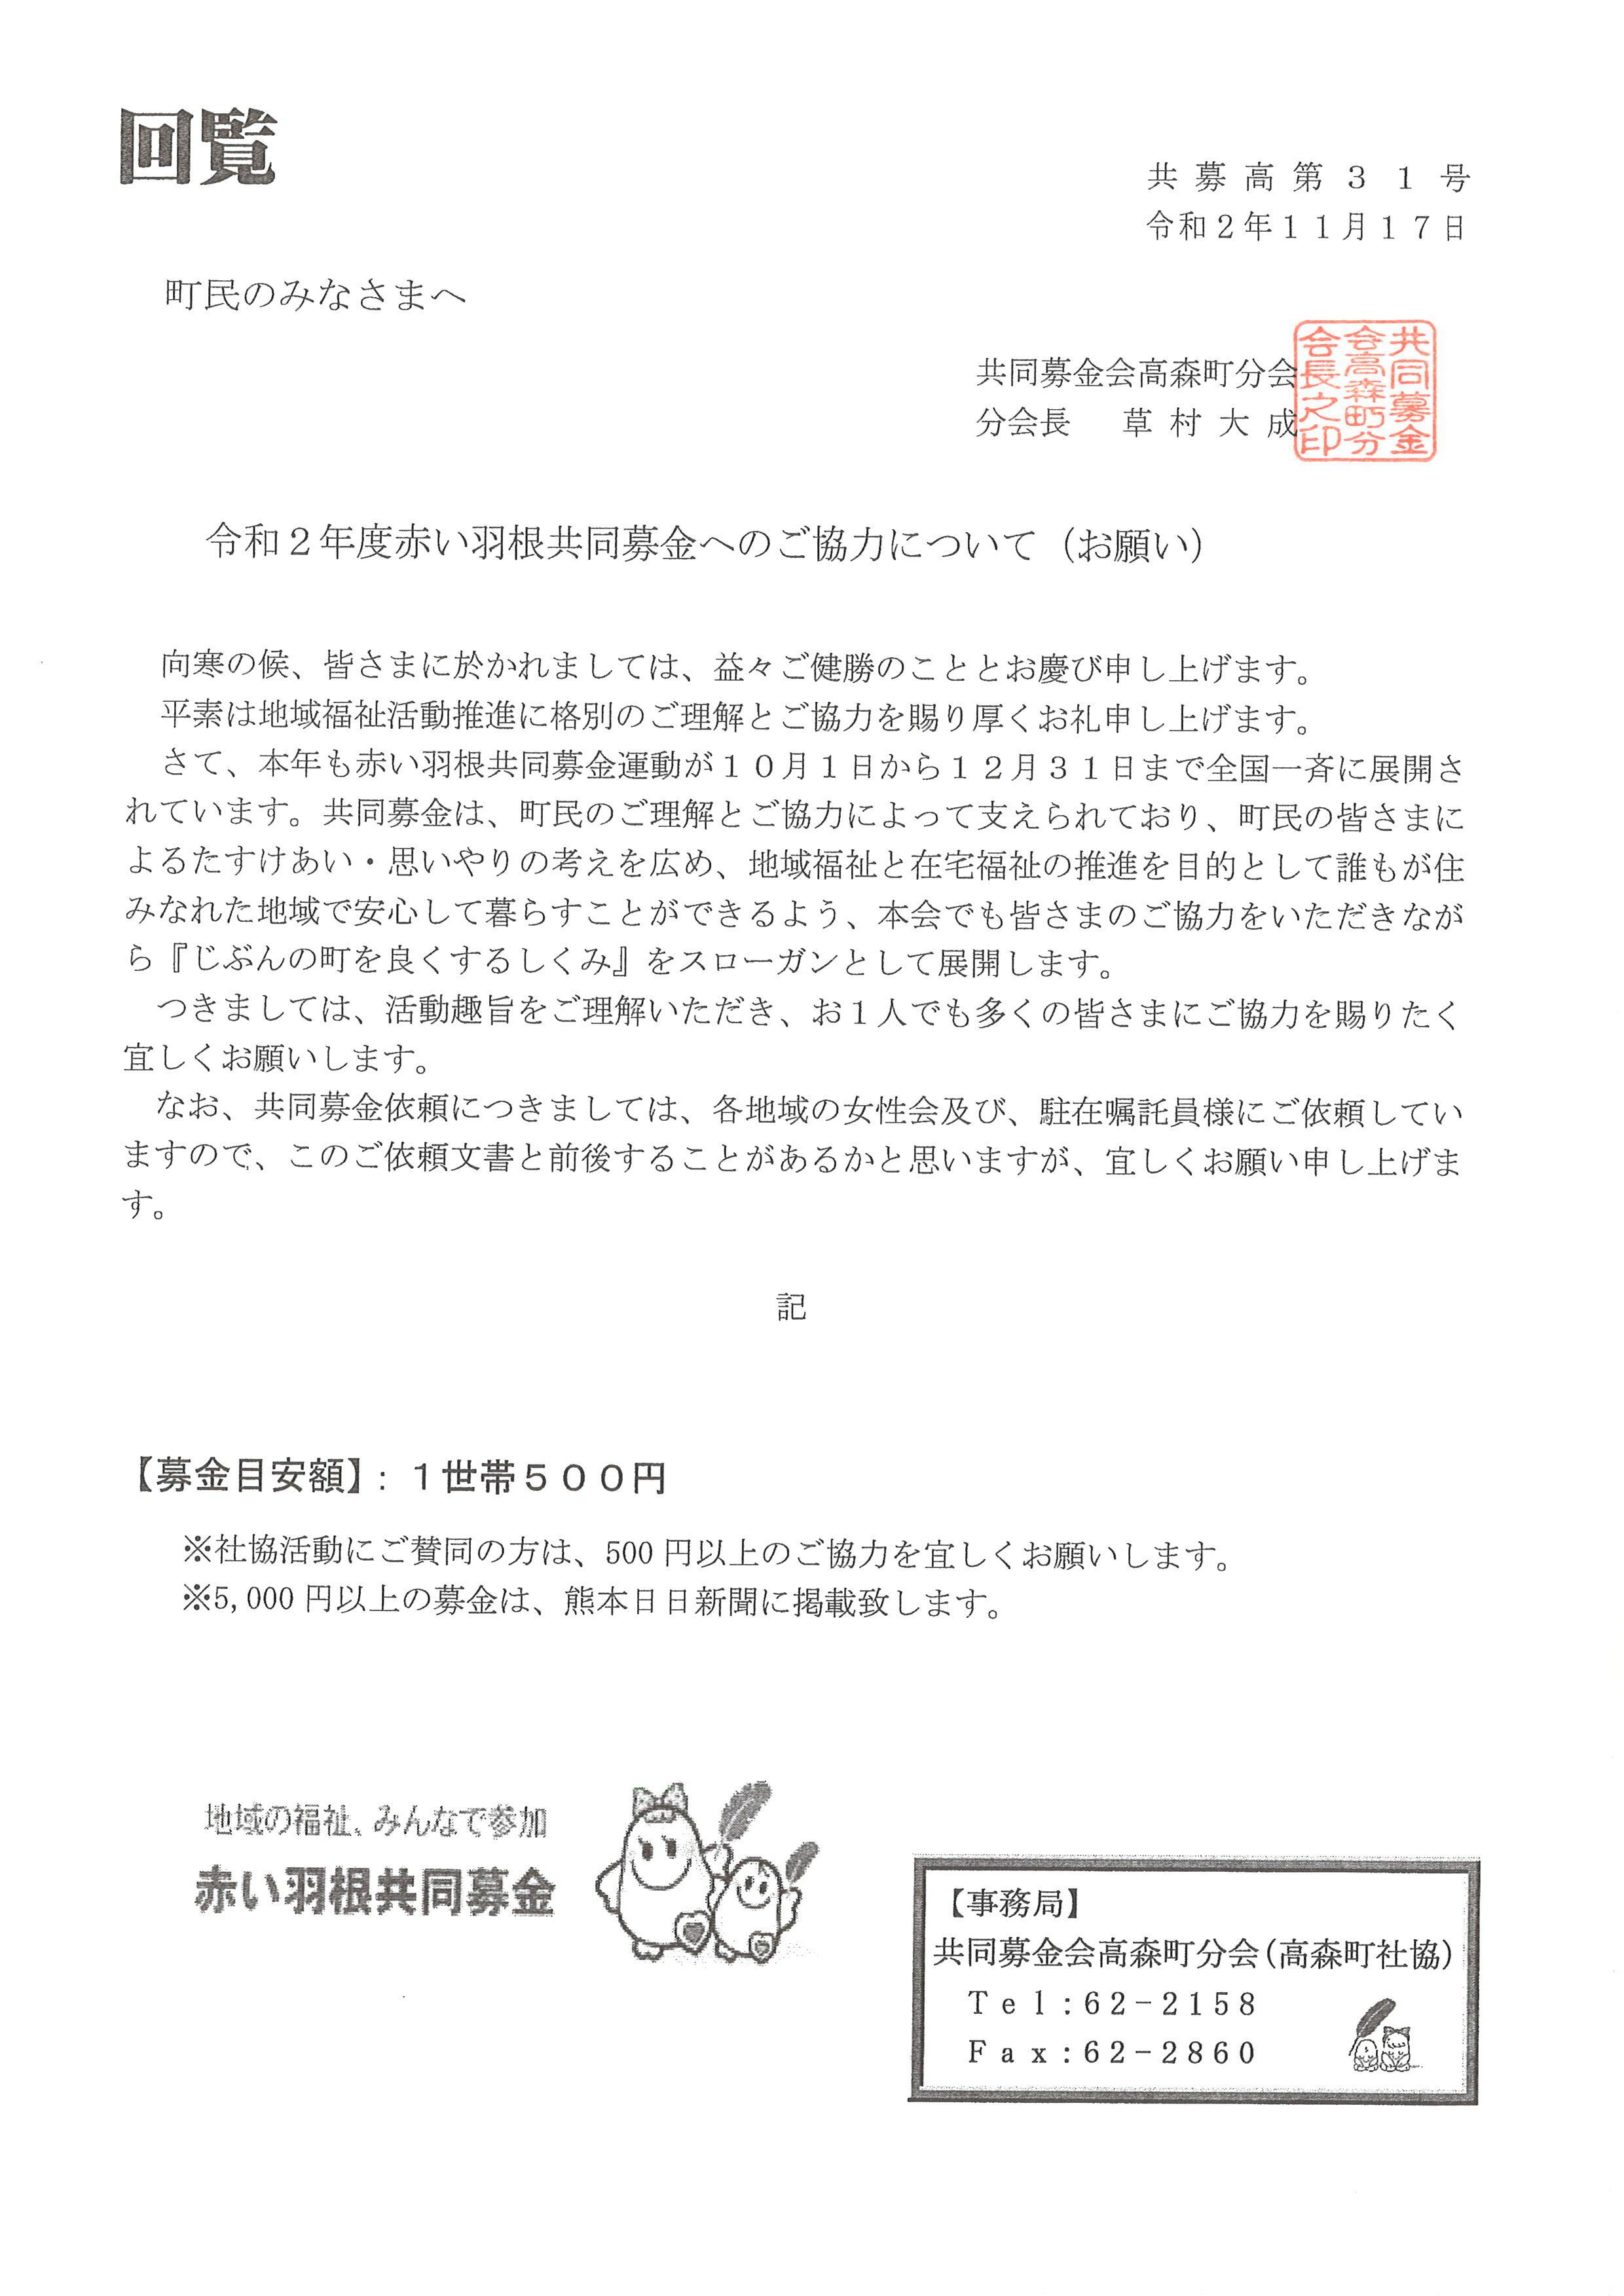 http://www.town.takamori.kumamoto.jp/chosha/somu/upload/f85807d731317ce0b8217d63d5c65a83e0484ea2.jpg